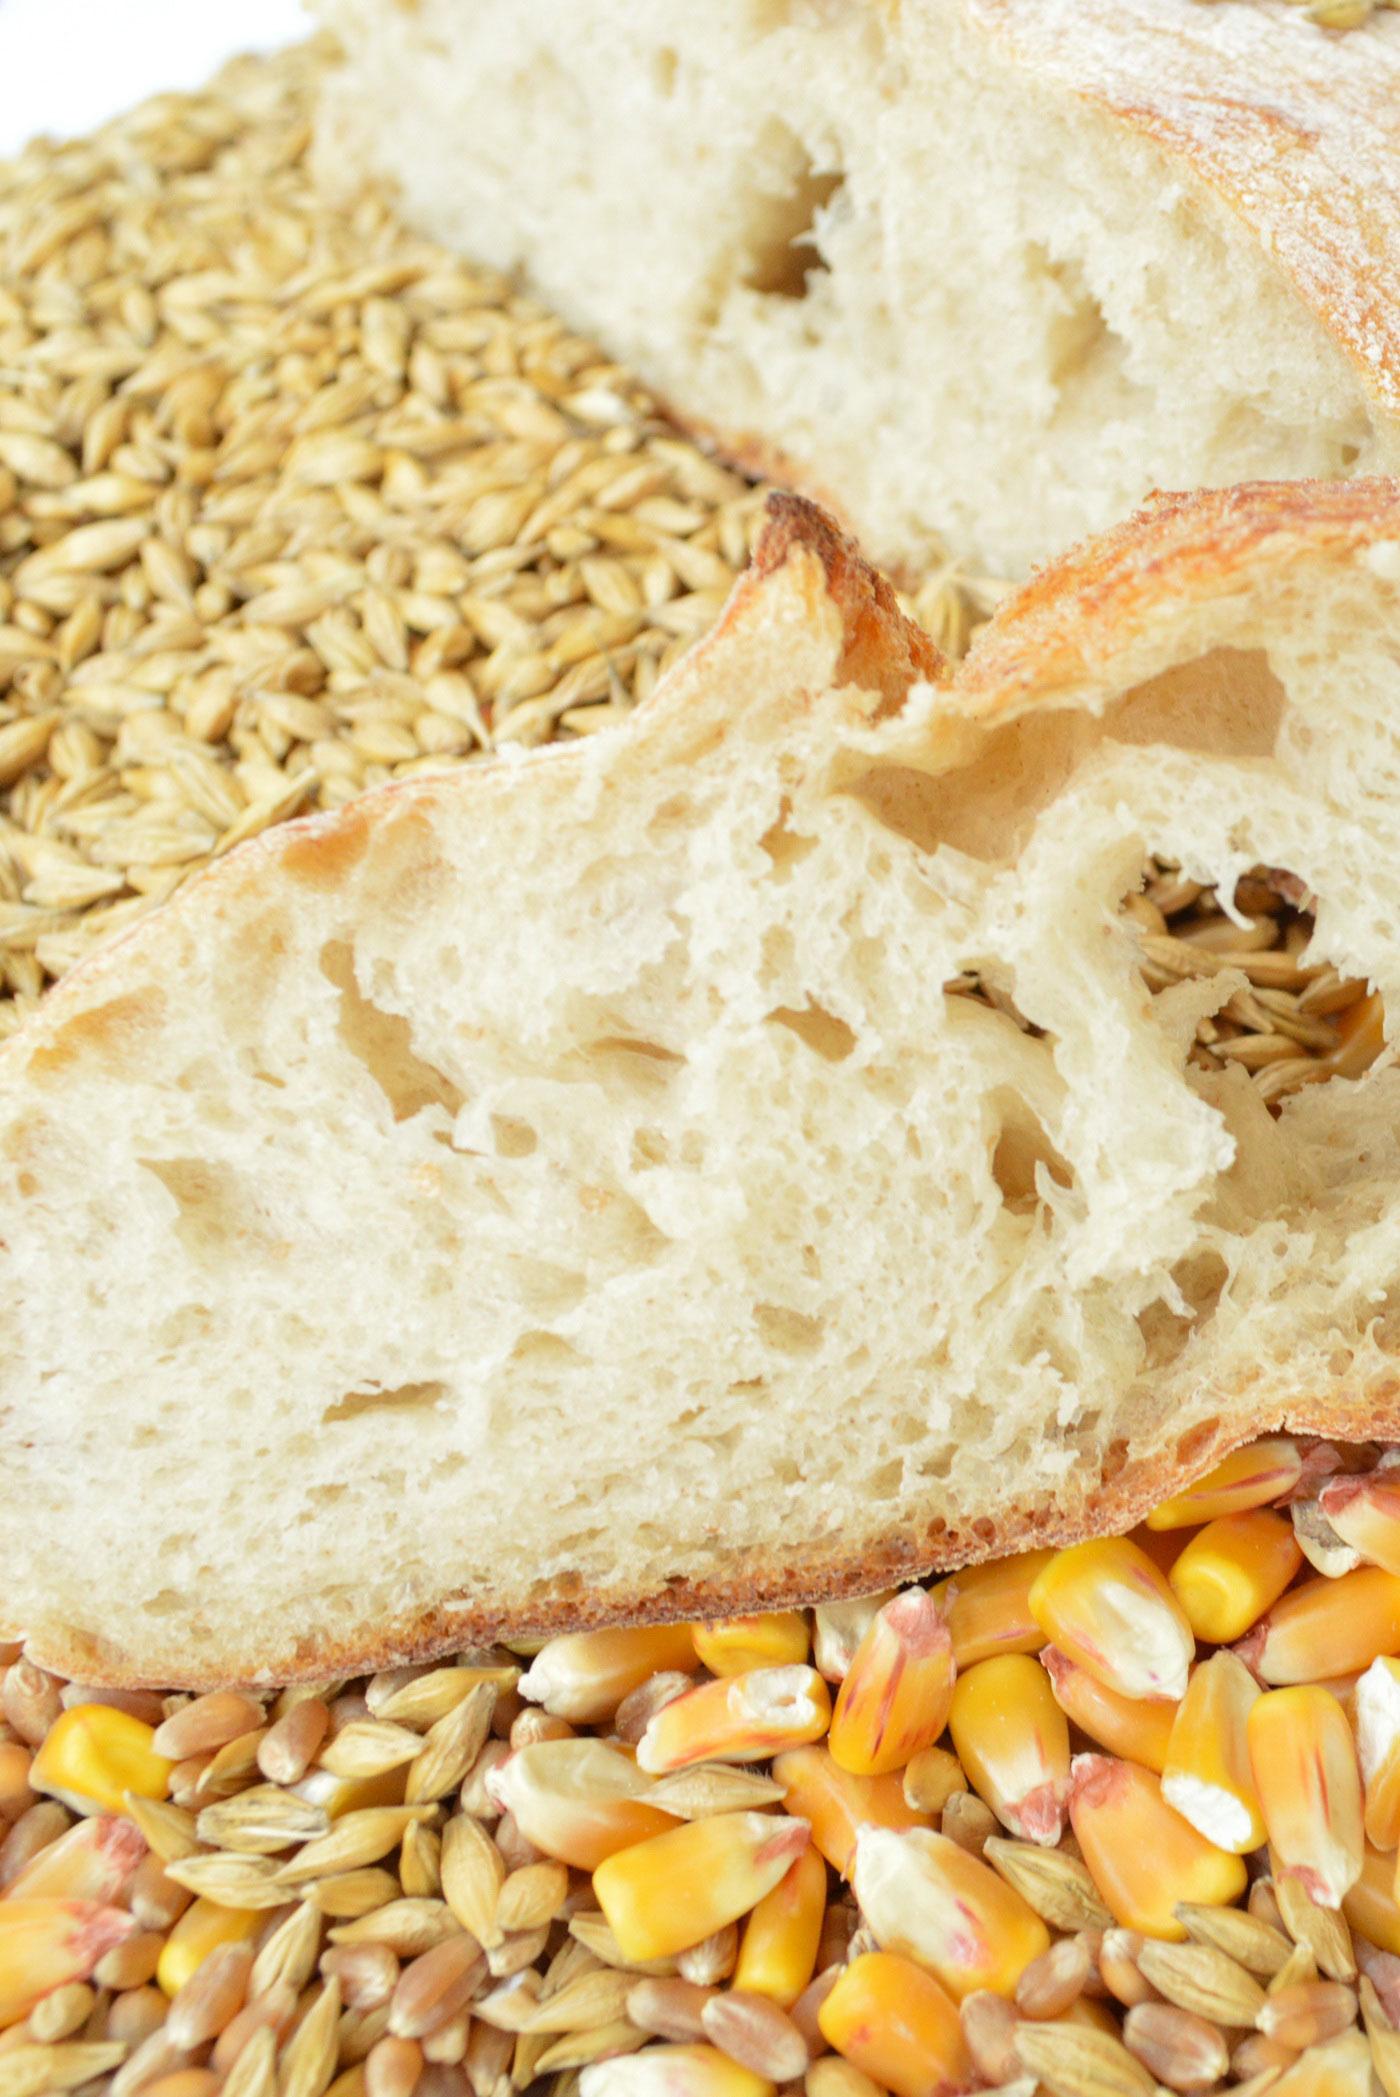 10 Major Protein Sources for Vegans